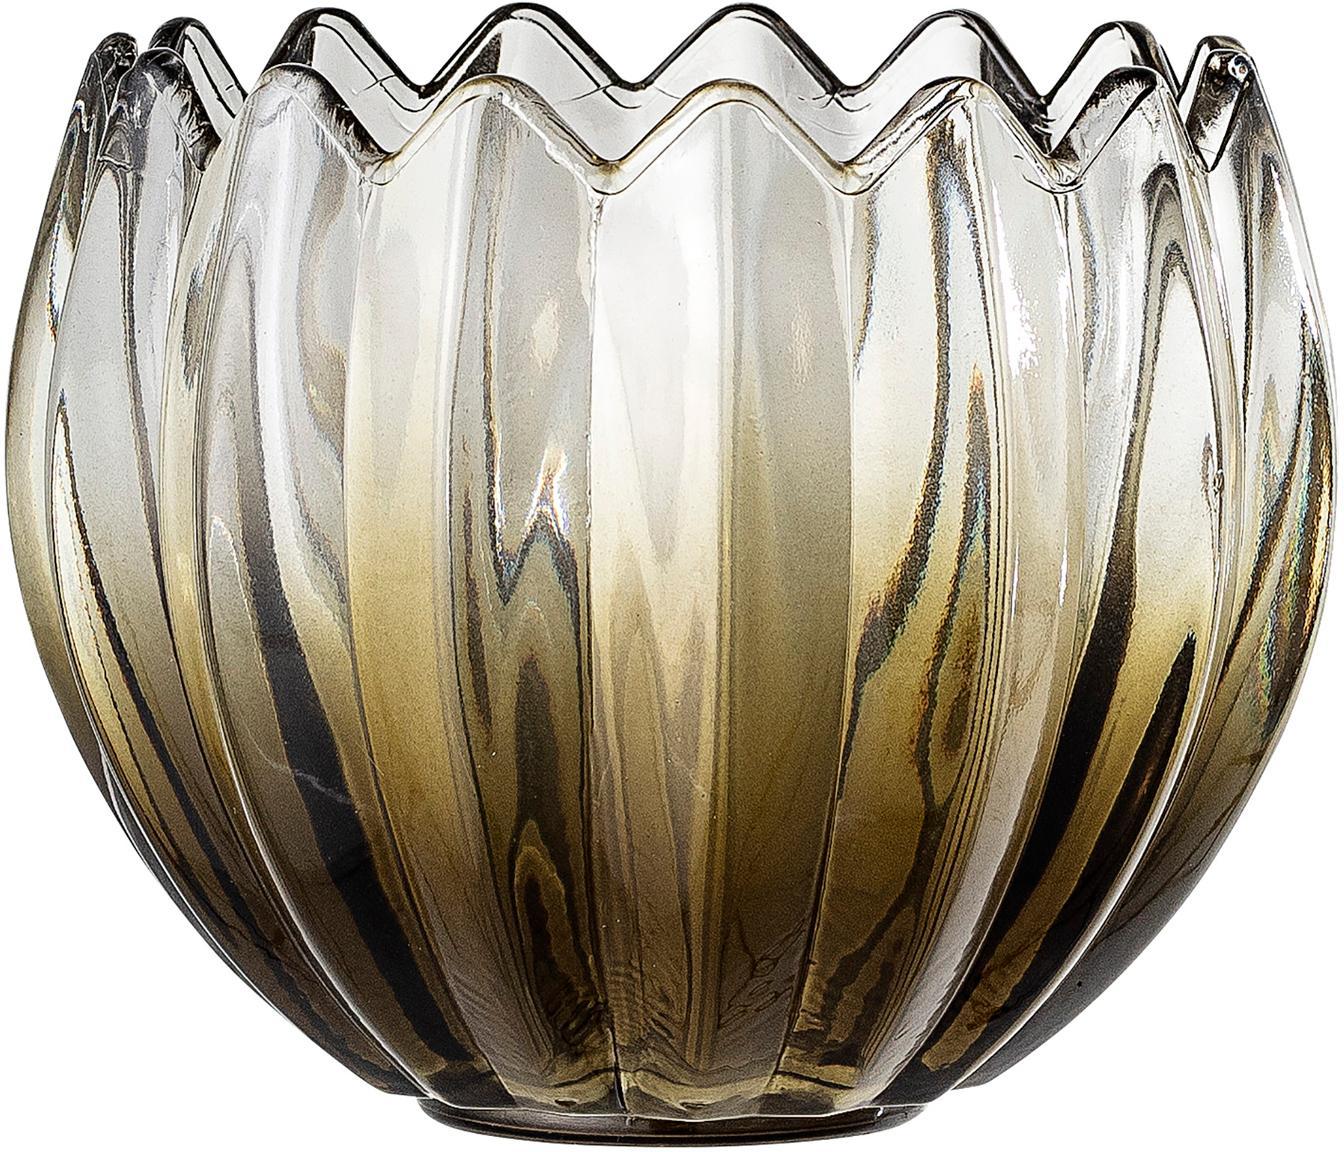 Windlicht Viva, Glas, Groen, transparant, Ø 13 x H 11 cm